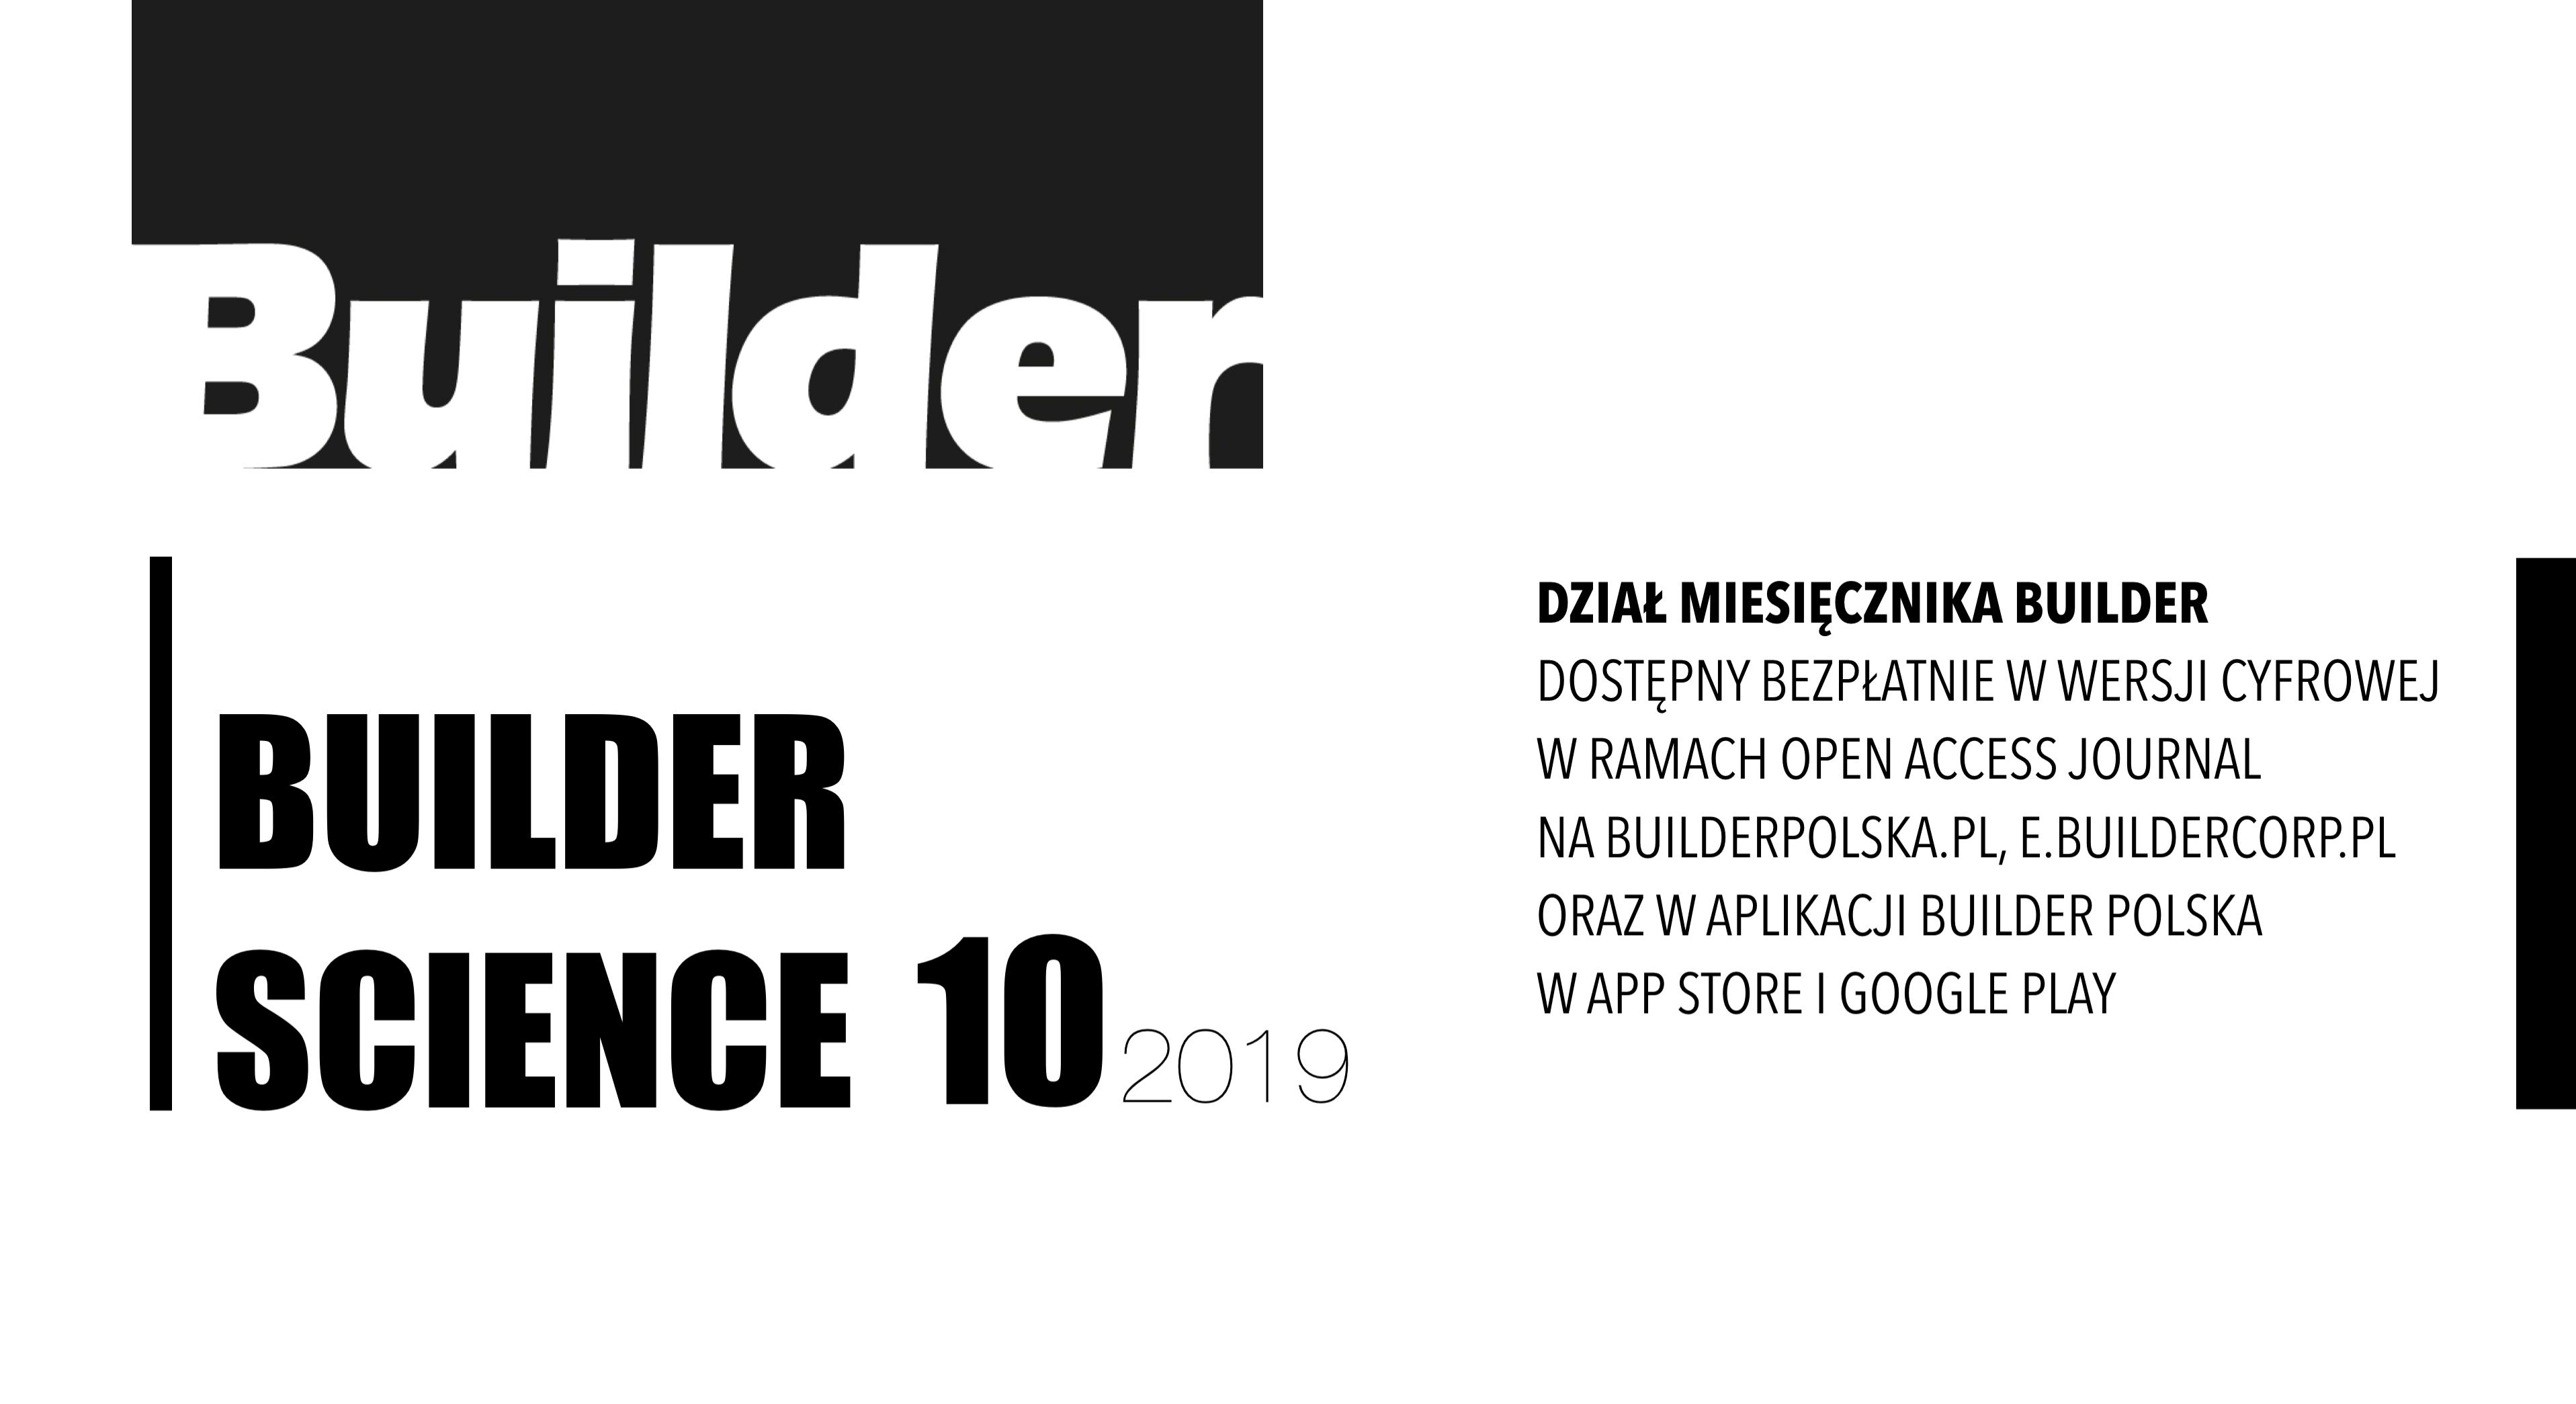 BUILDER SCIENCE 10.2019